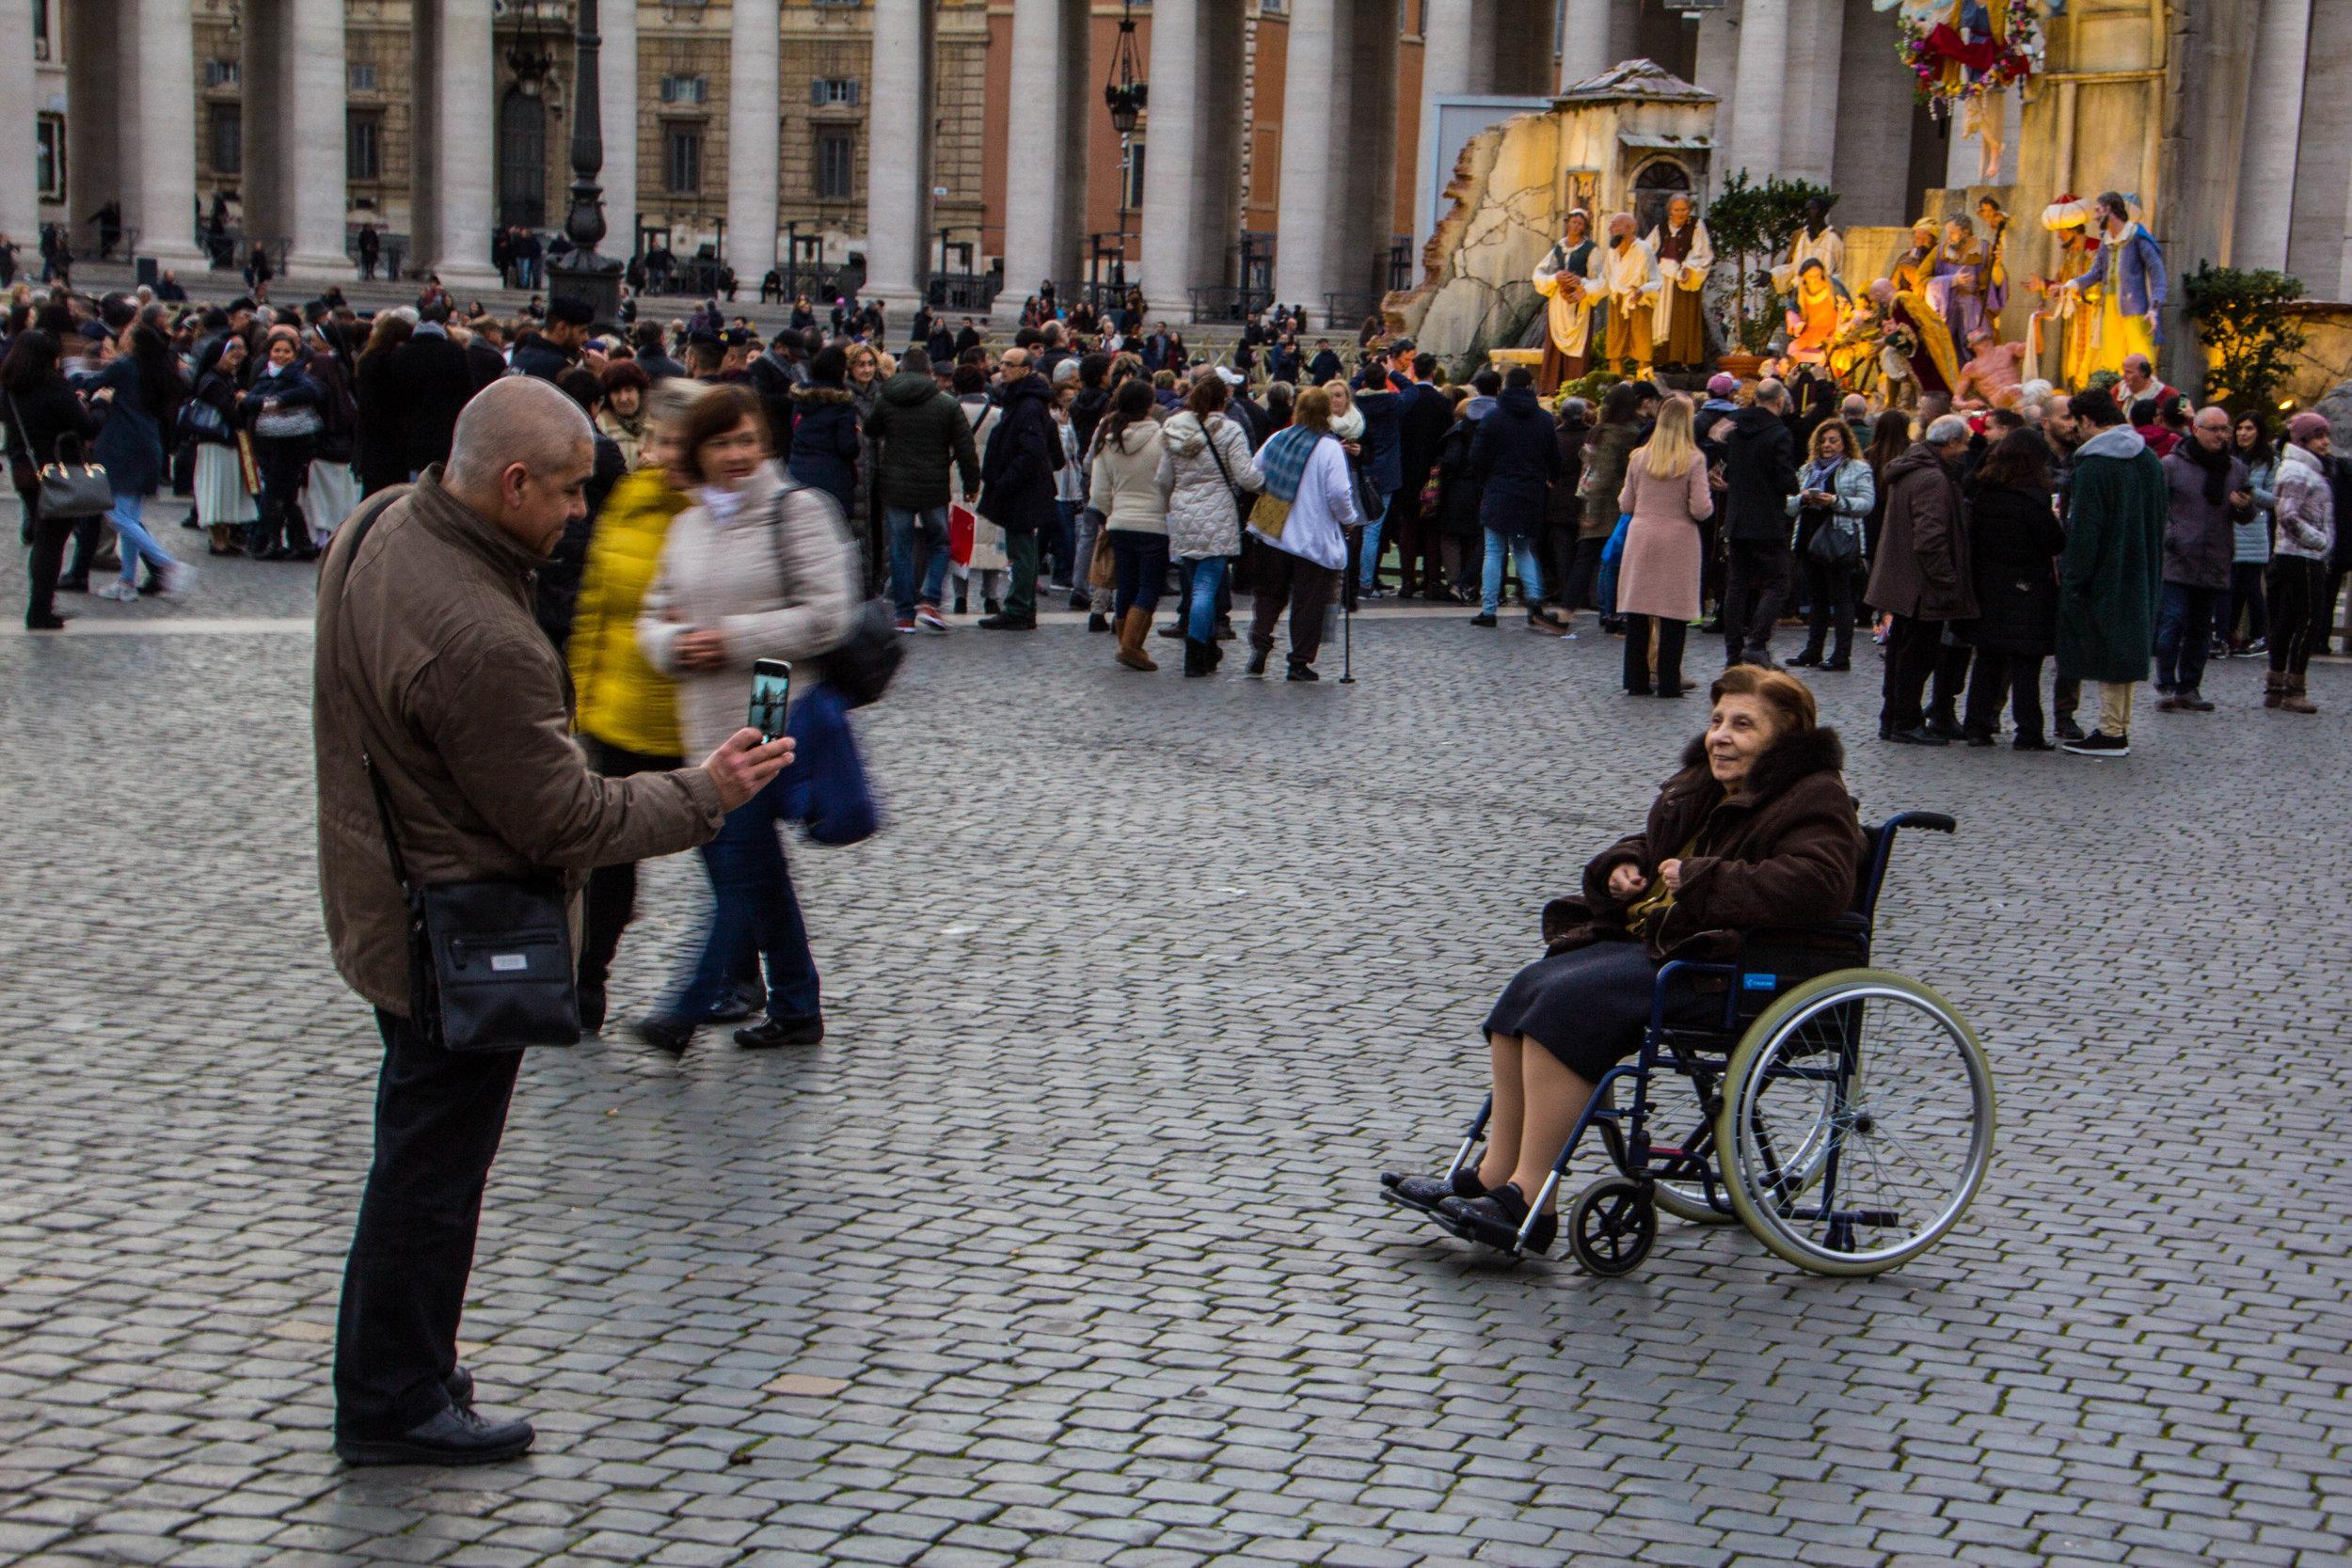 vatican-city-rome-italy-9.jpg